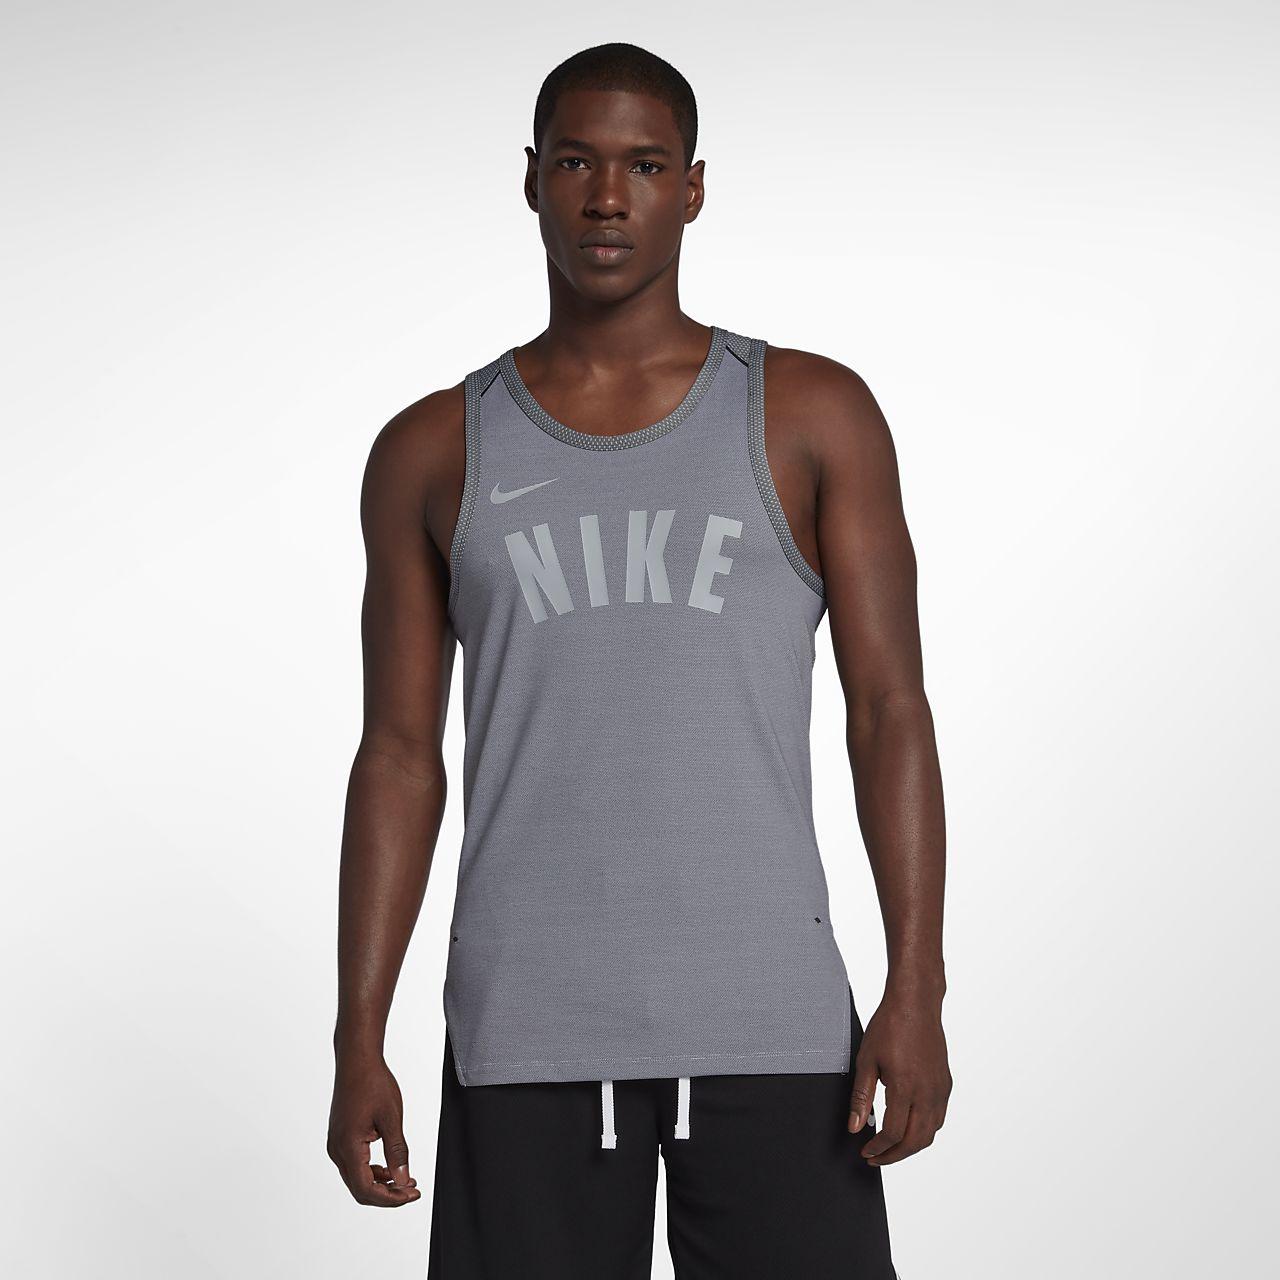 6e6a6167a0983 Mens Nike Dri Fit Sleeveless Shirt – Rockwall Auction